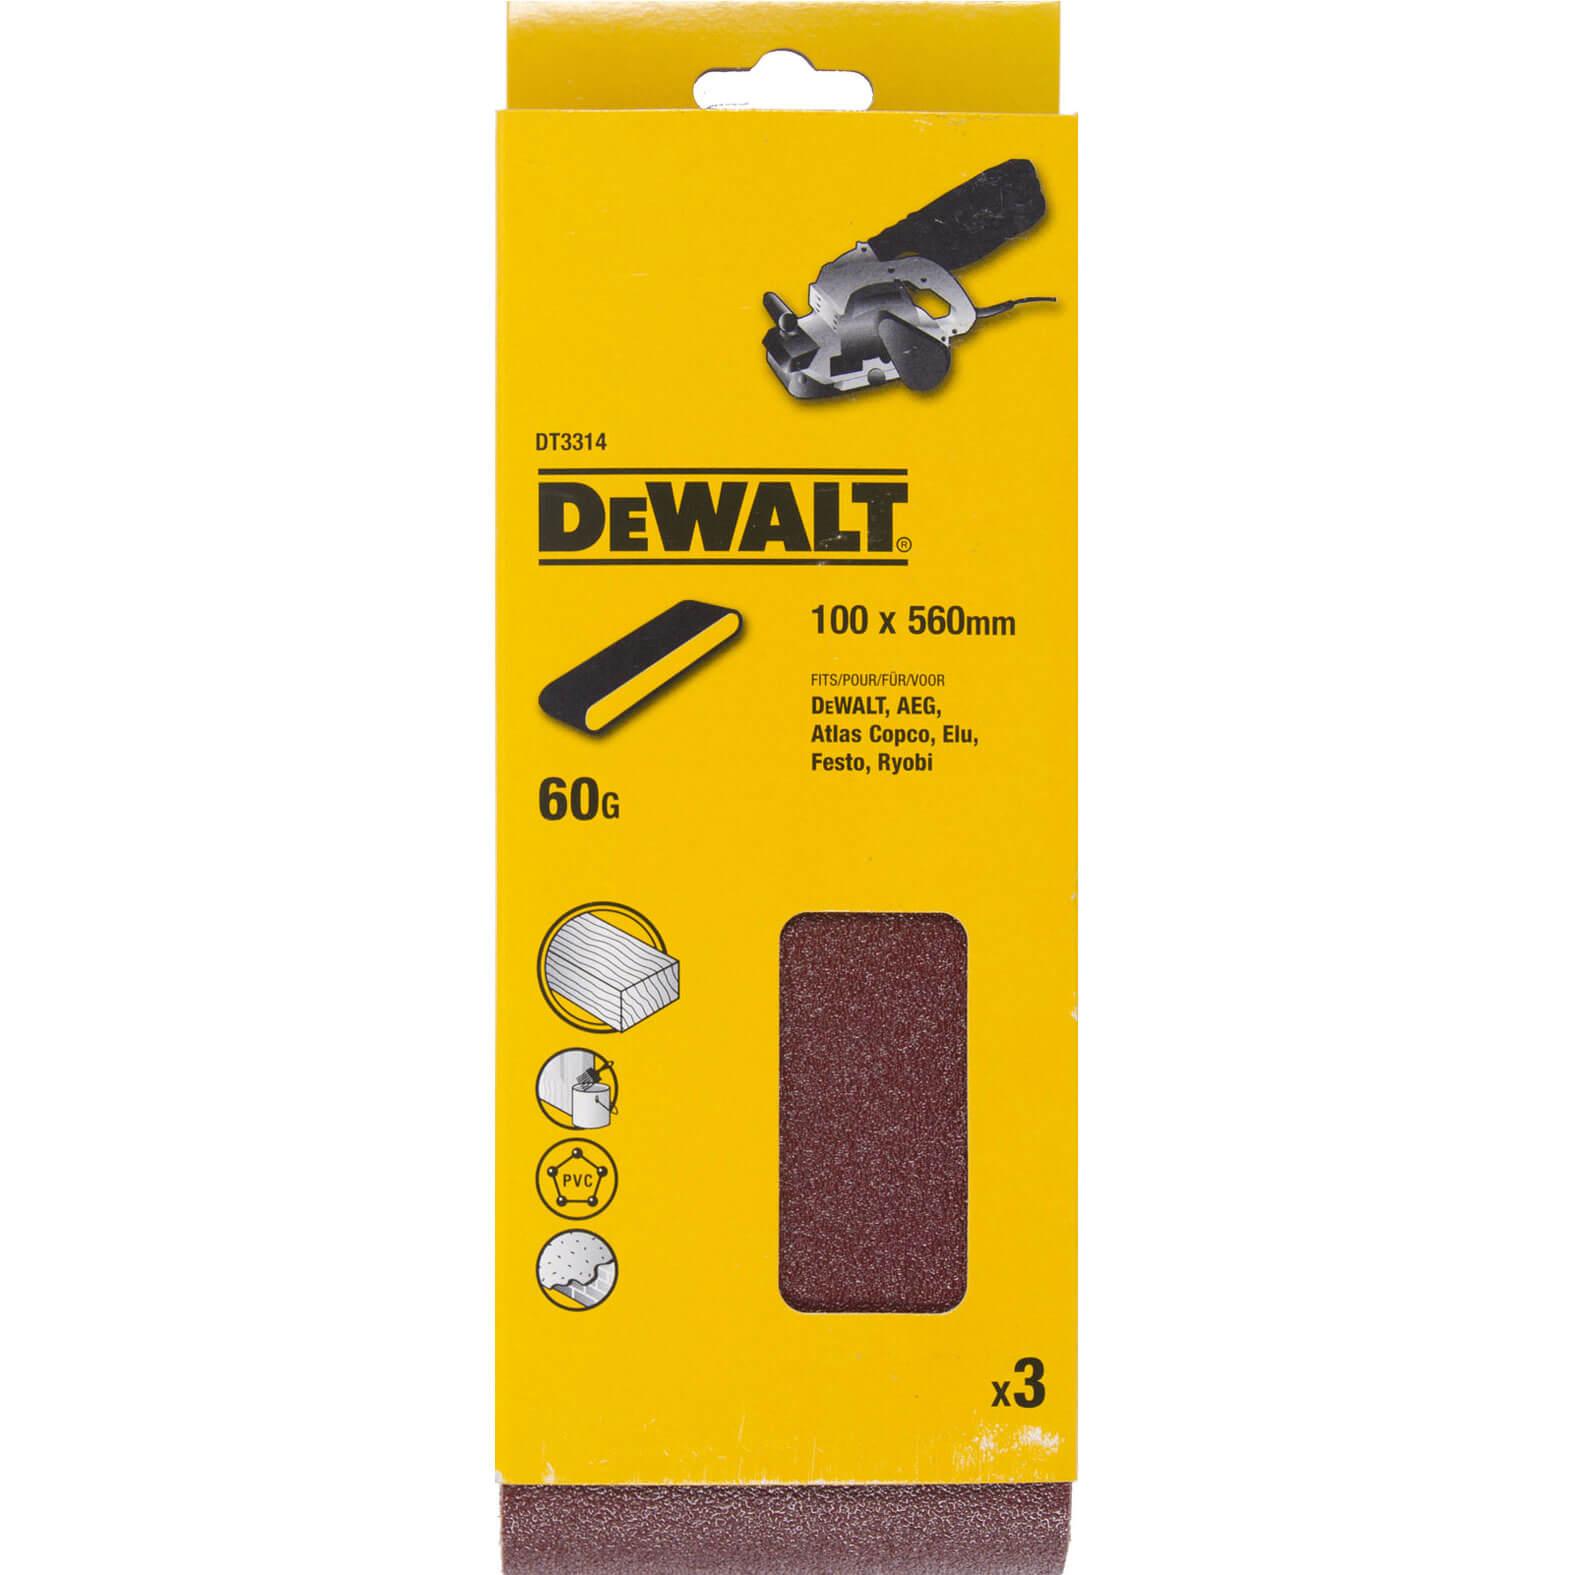 Image of DeWalt 100 x 560mm Multi Purpose Sanding Belts 100mm x 560mm 60g Pack of 3